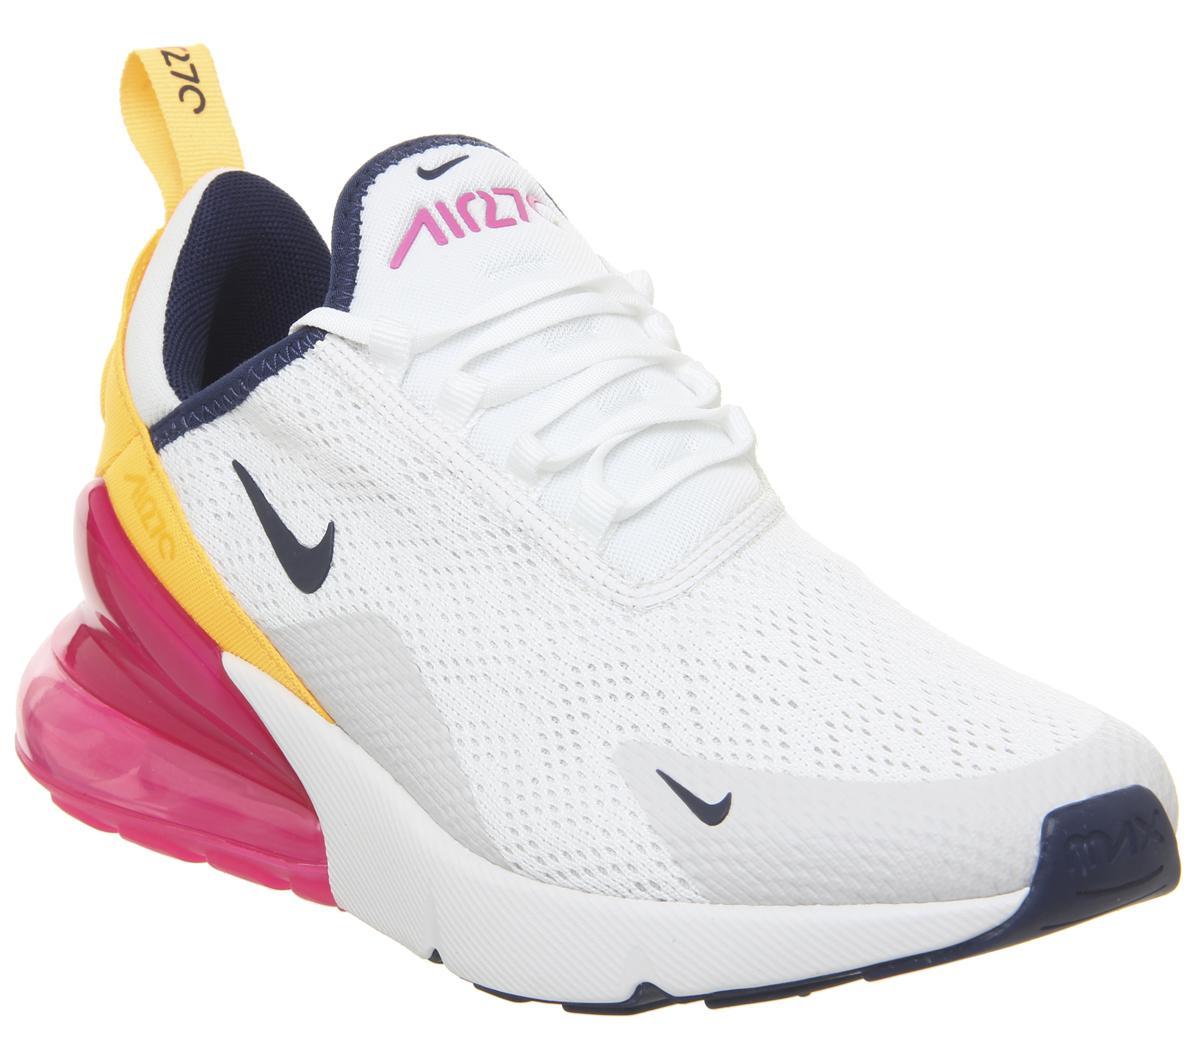 Women's Nike Air Max 270 Shoes Summit WhiteMidnight Navy